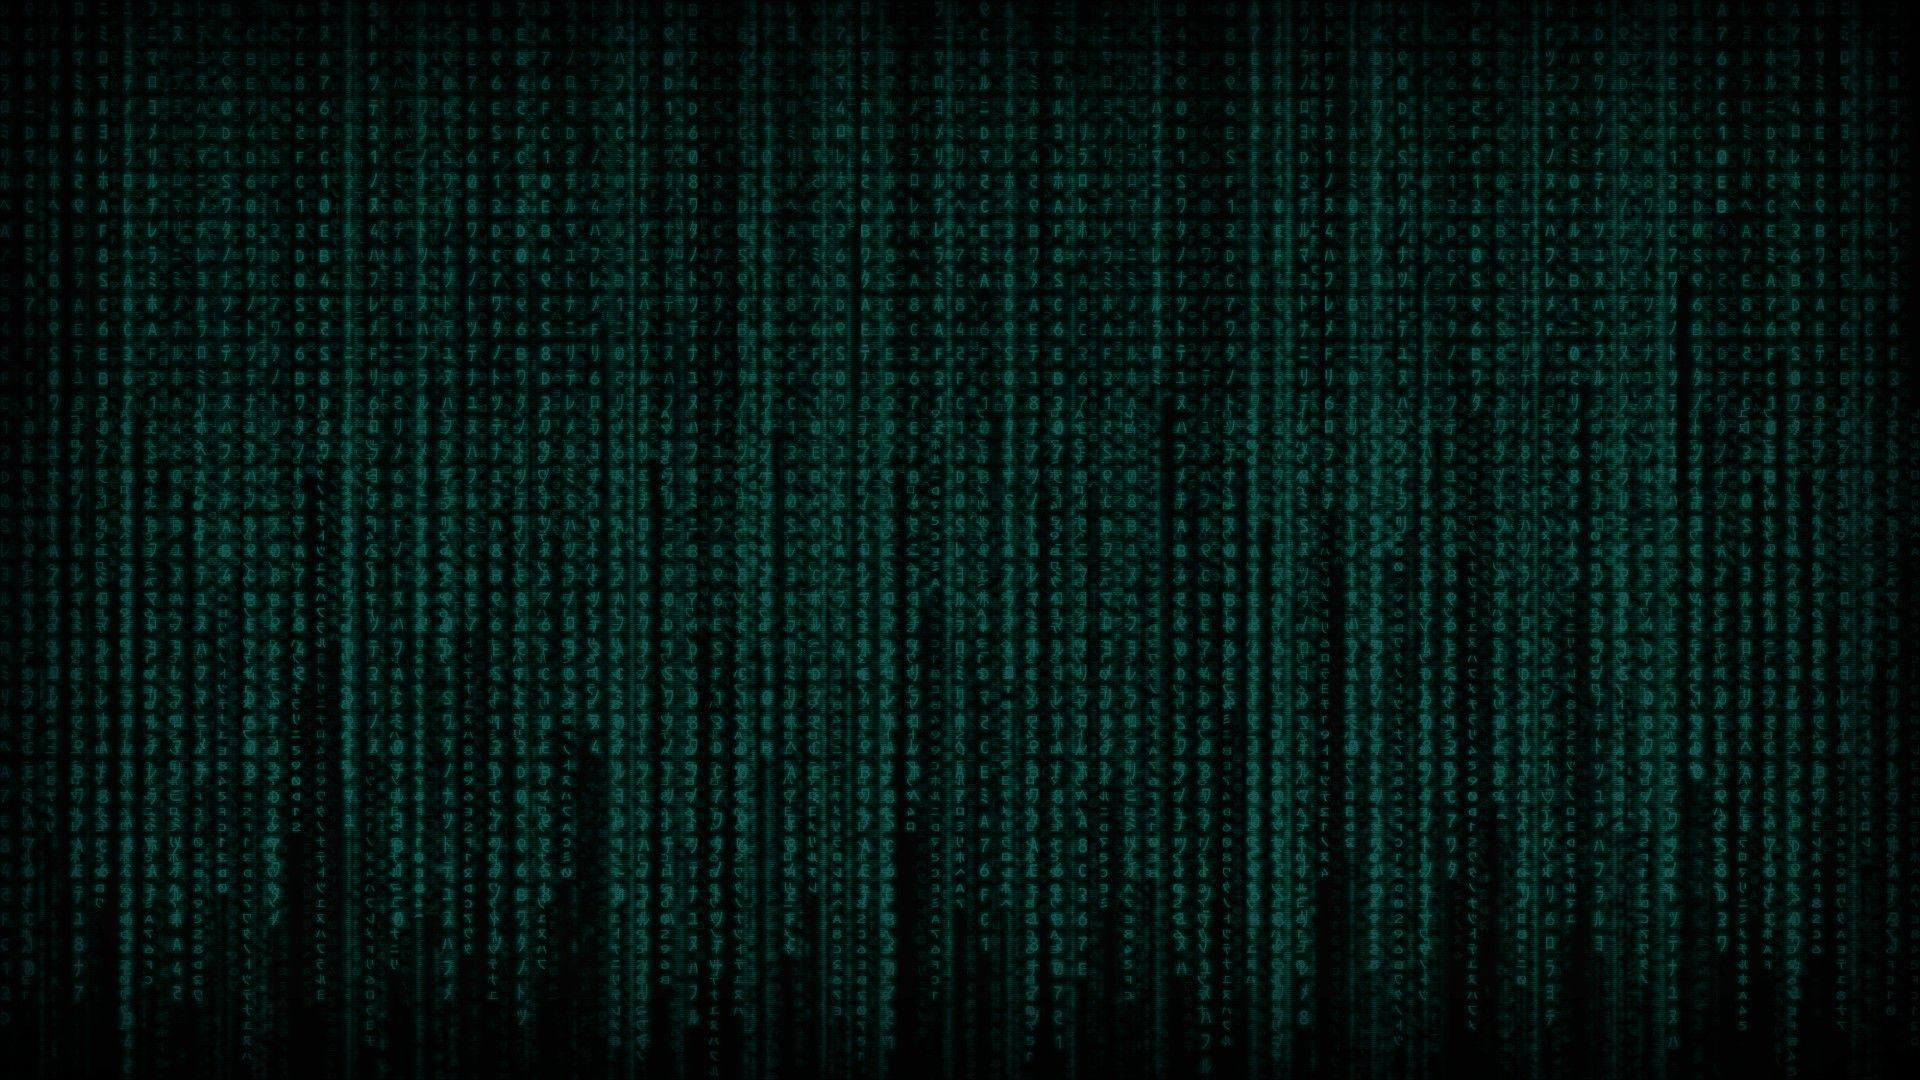 Green Matrix Code Wallpaper Code Wallpaper 1920x1200 Wallpaper Wallpaper